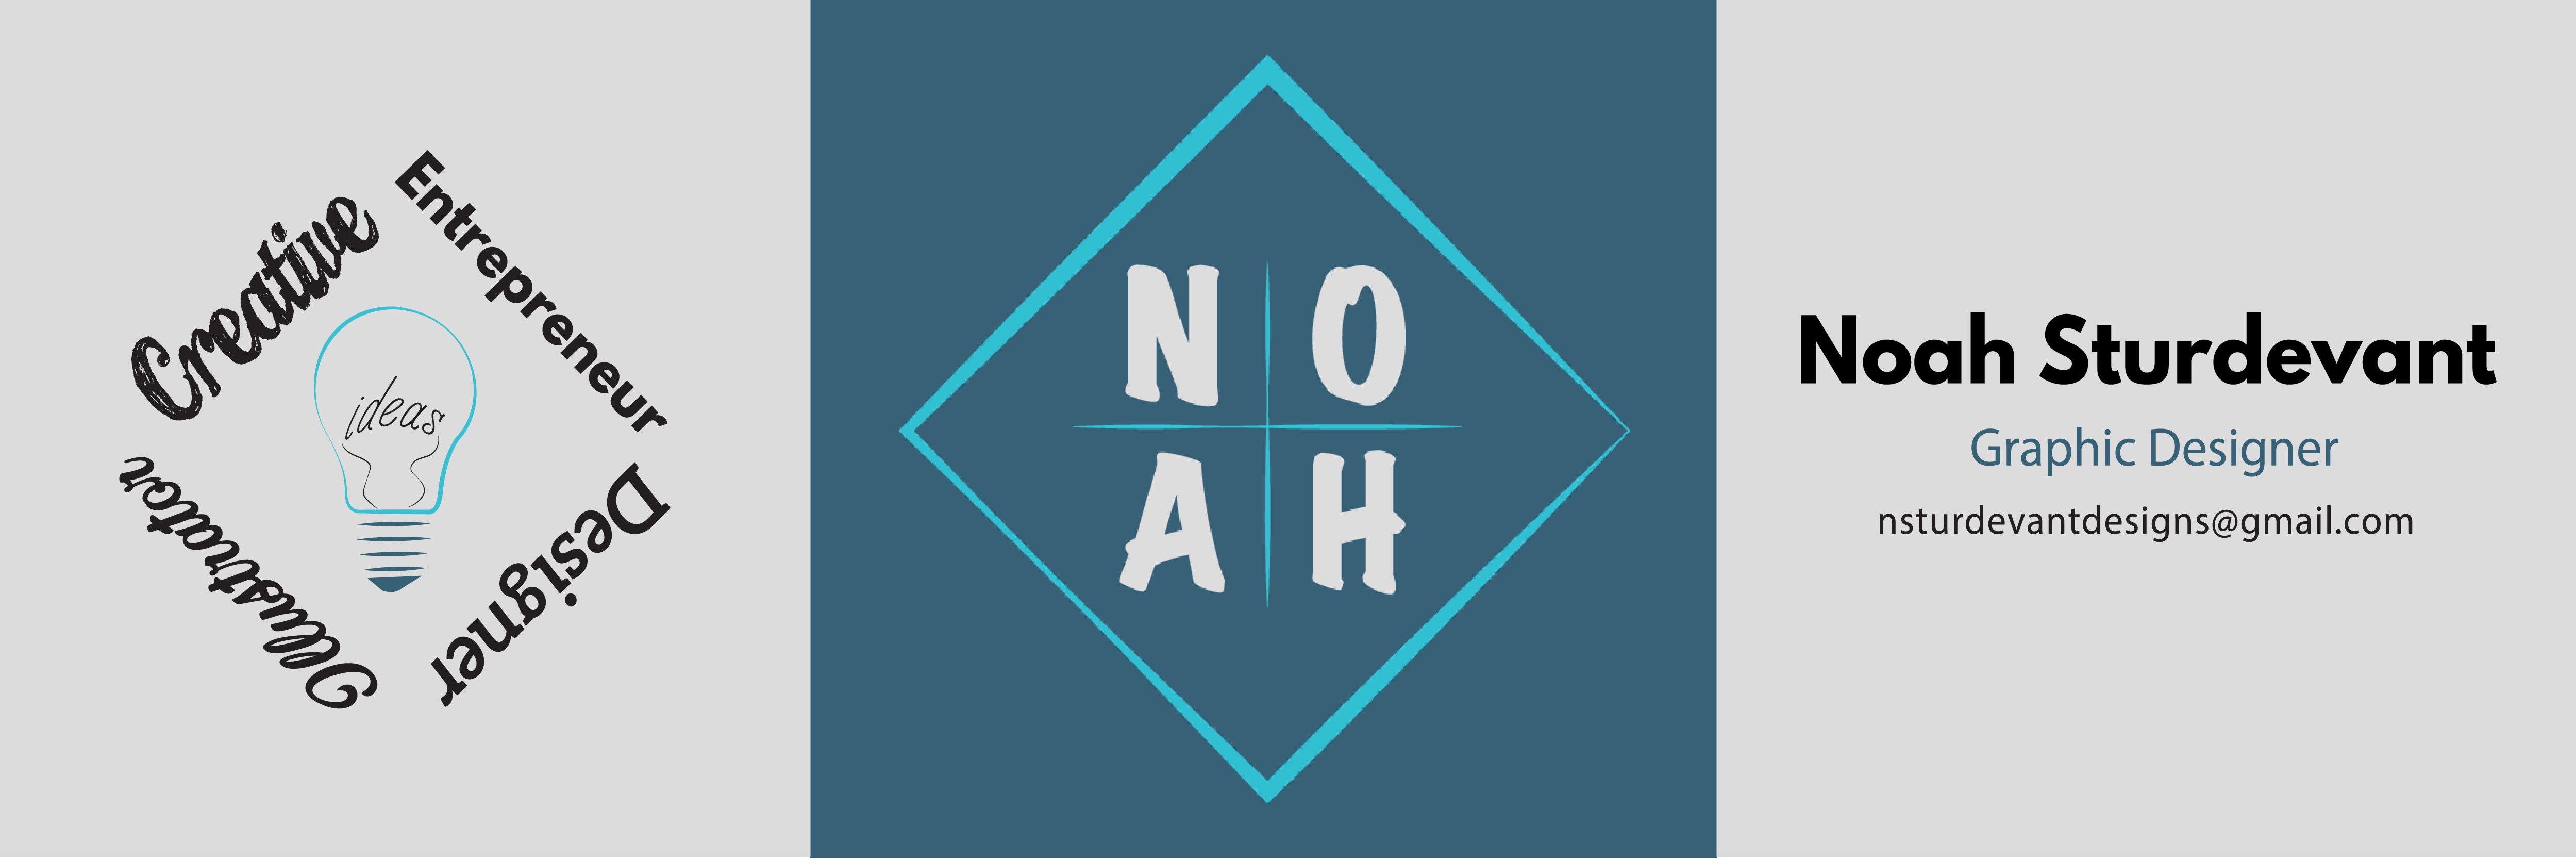 Noah Sturdevant